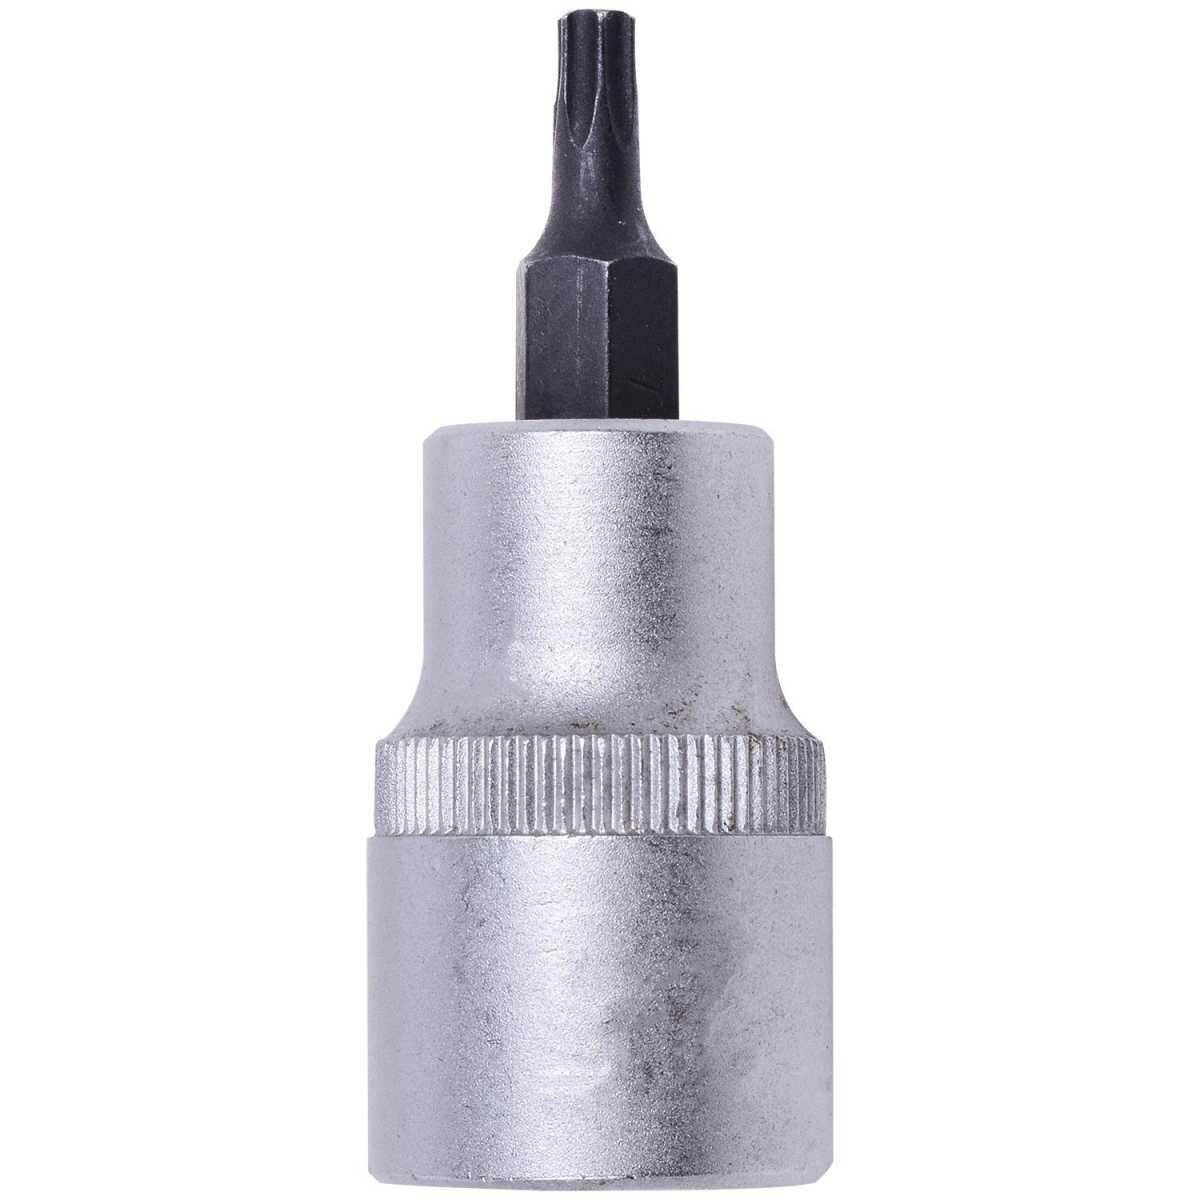 Soquete Hexalobular T 20 Curto Macho Enc. 1/2 060984 Robust